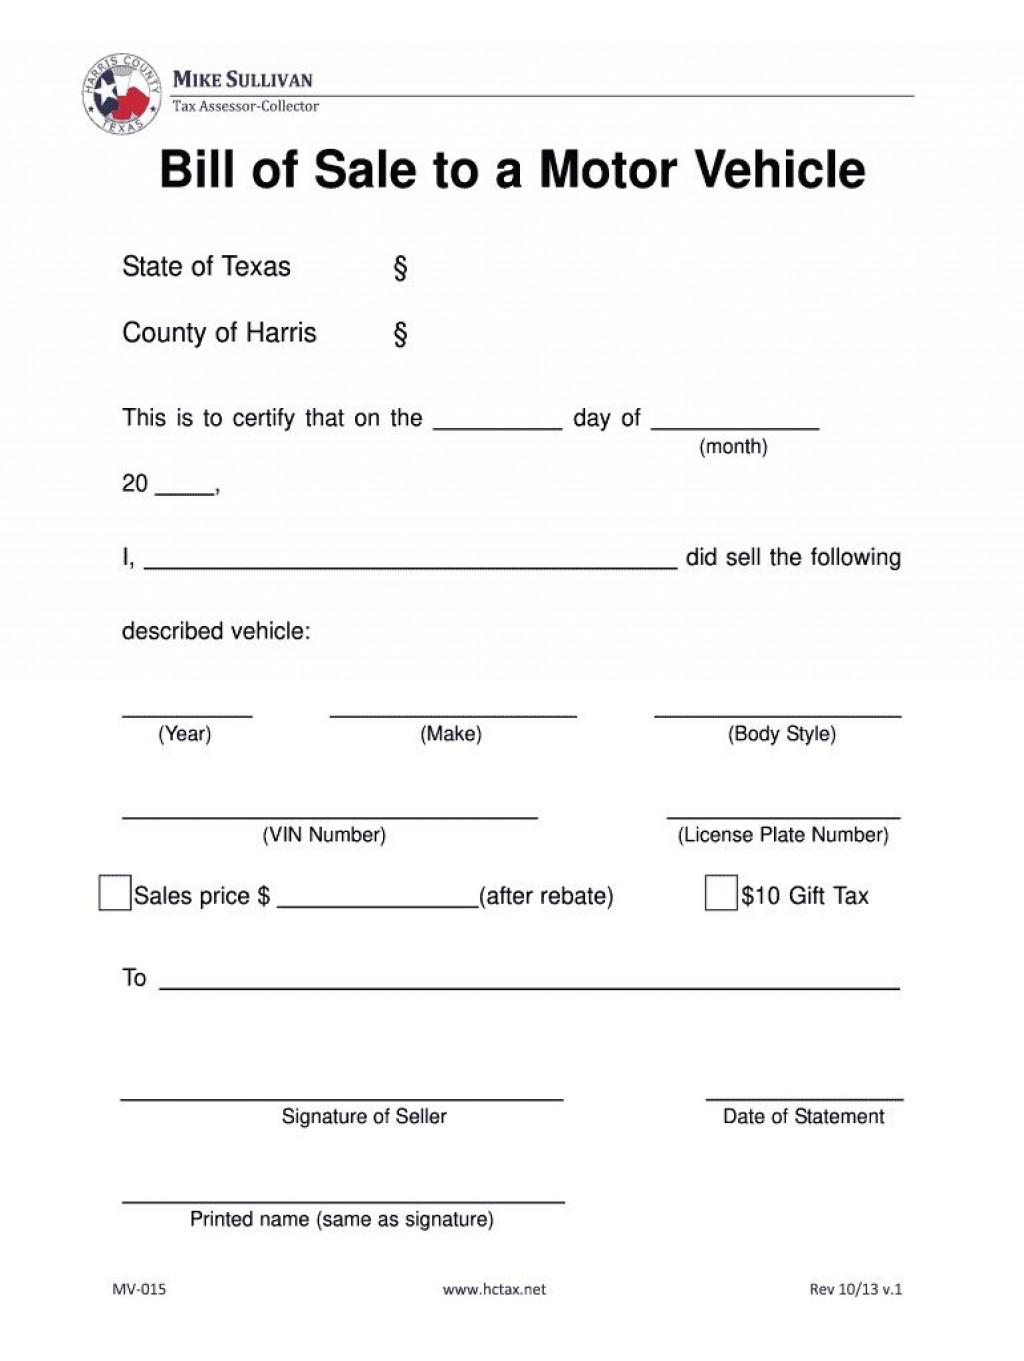 004 Archaicawful Bill Of Sale Template Texa Sample  Texas Free Car Form Dmv DocumentLarge